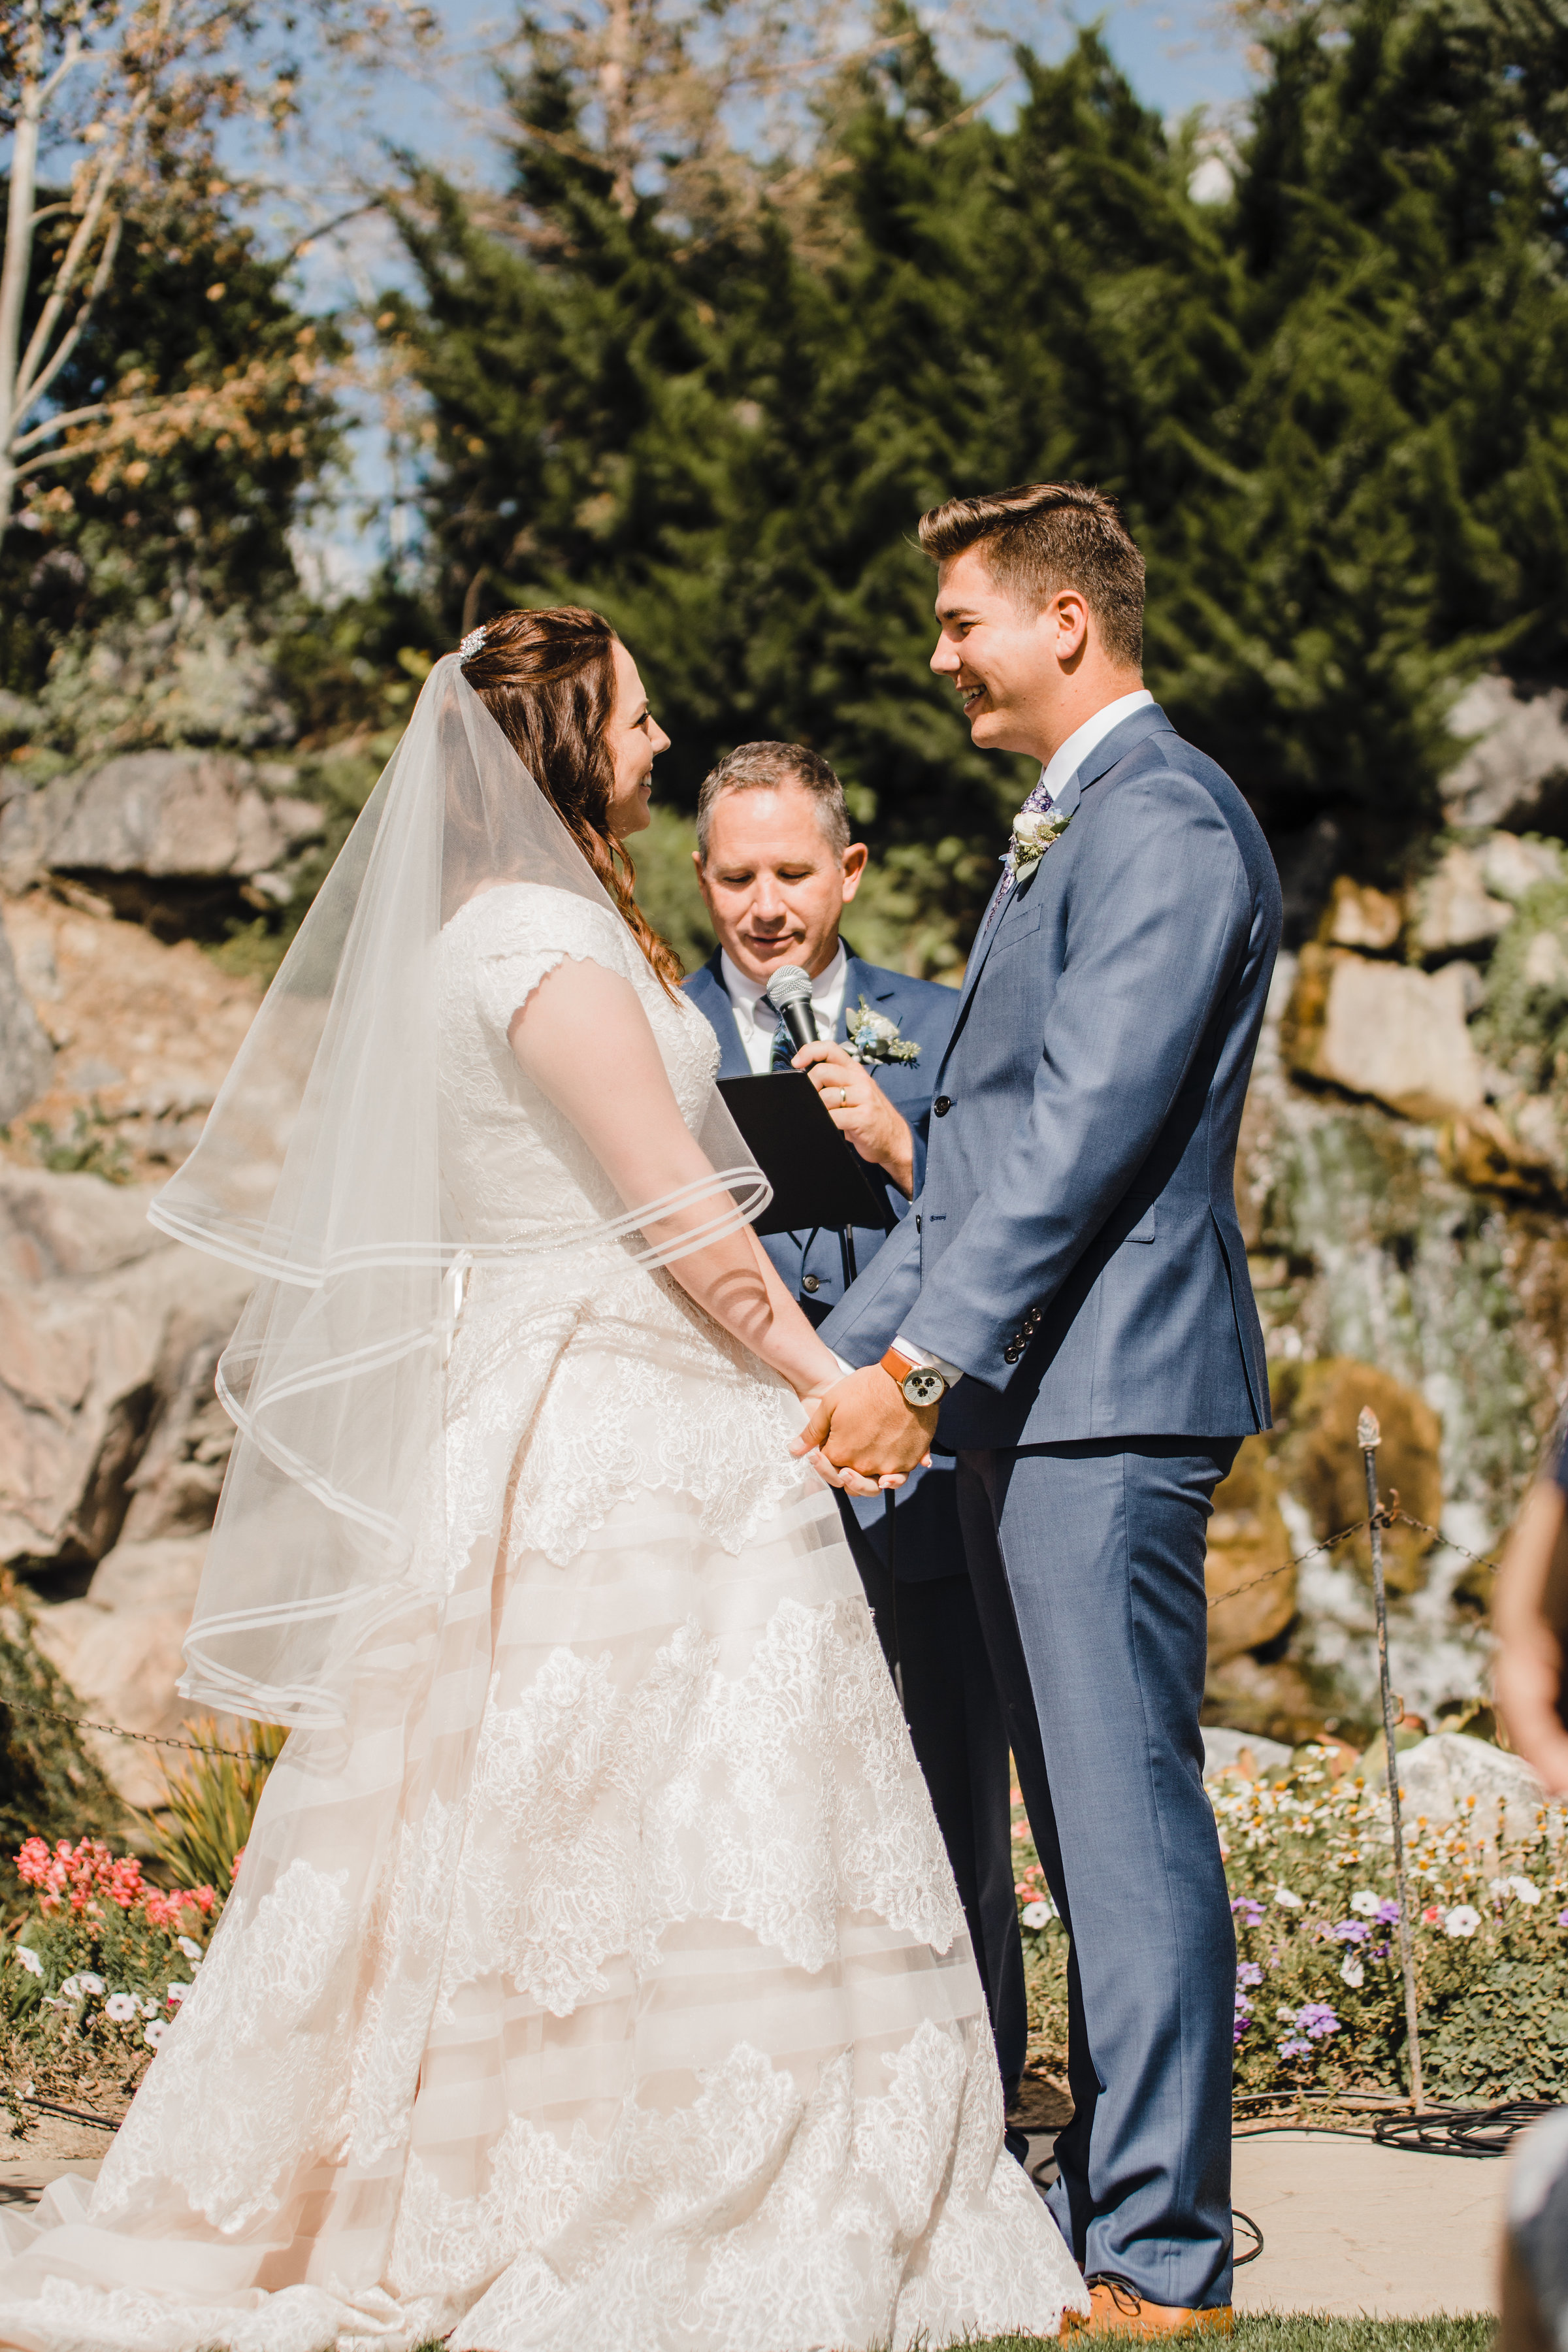 professional wedding photographer utah valley outdoor wedding ceremony holding hands